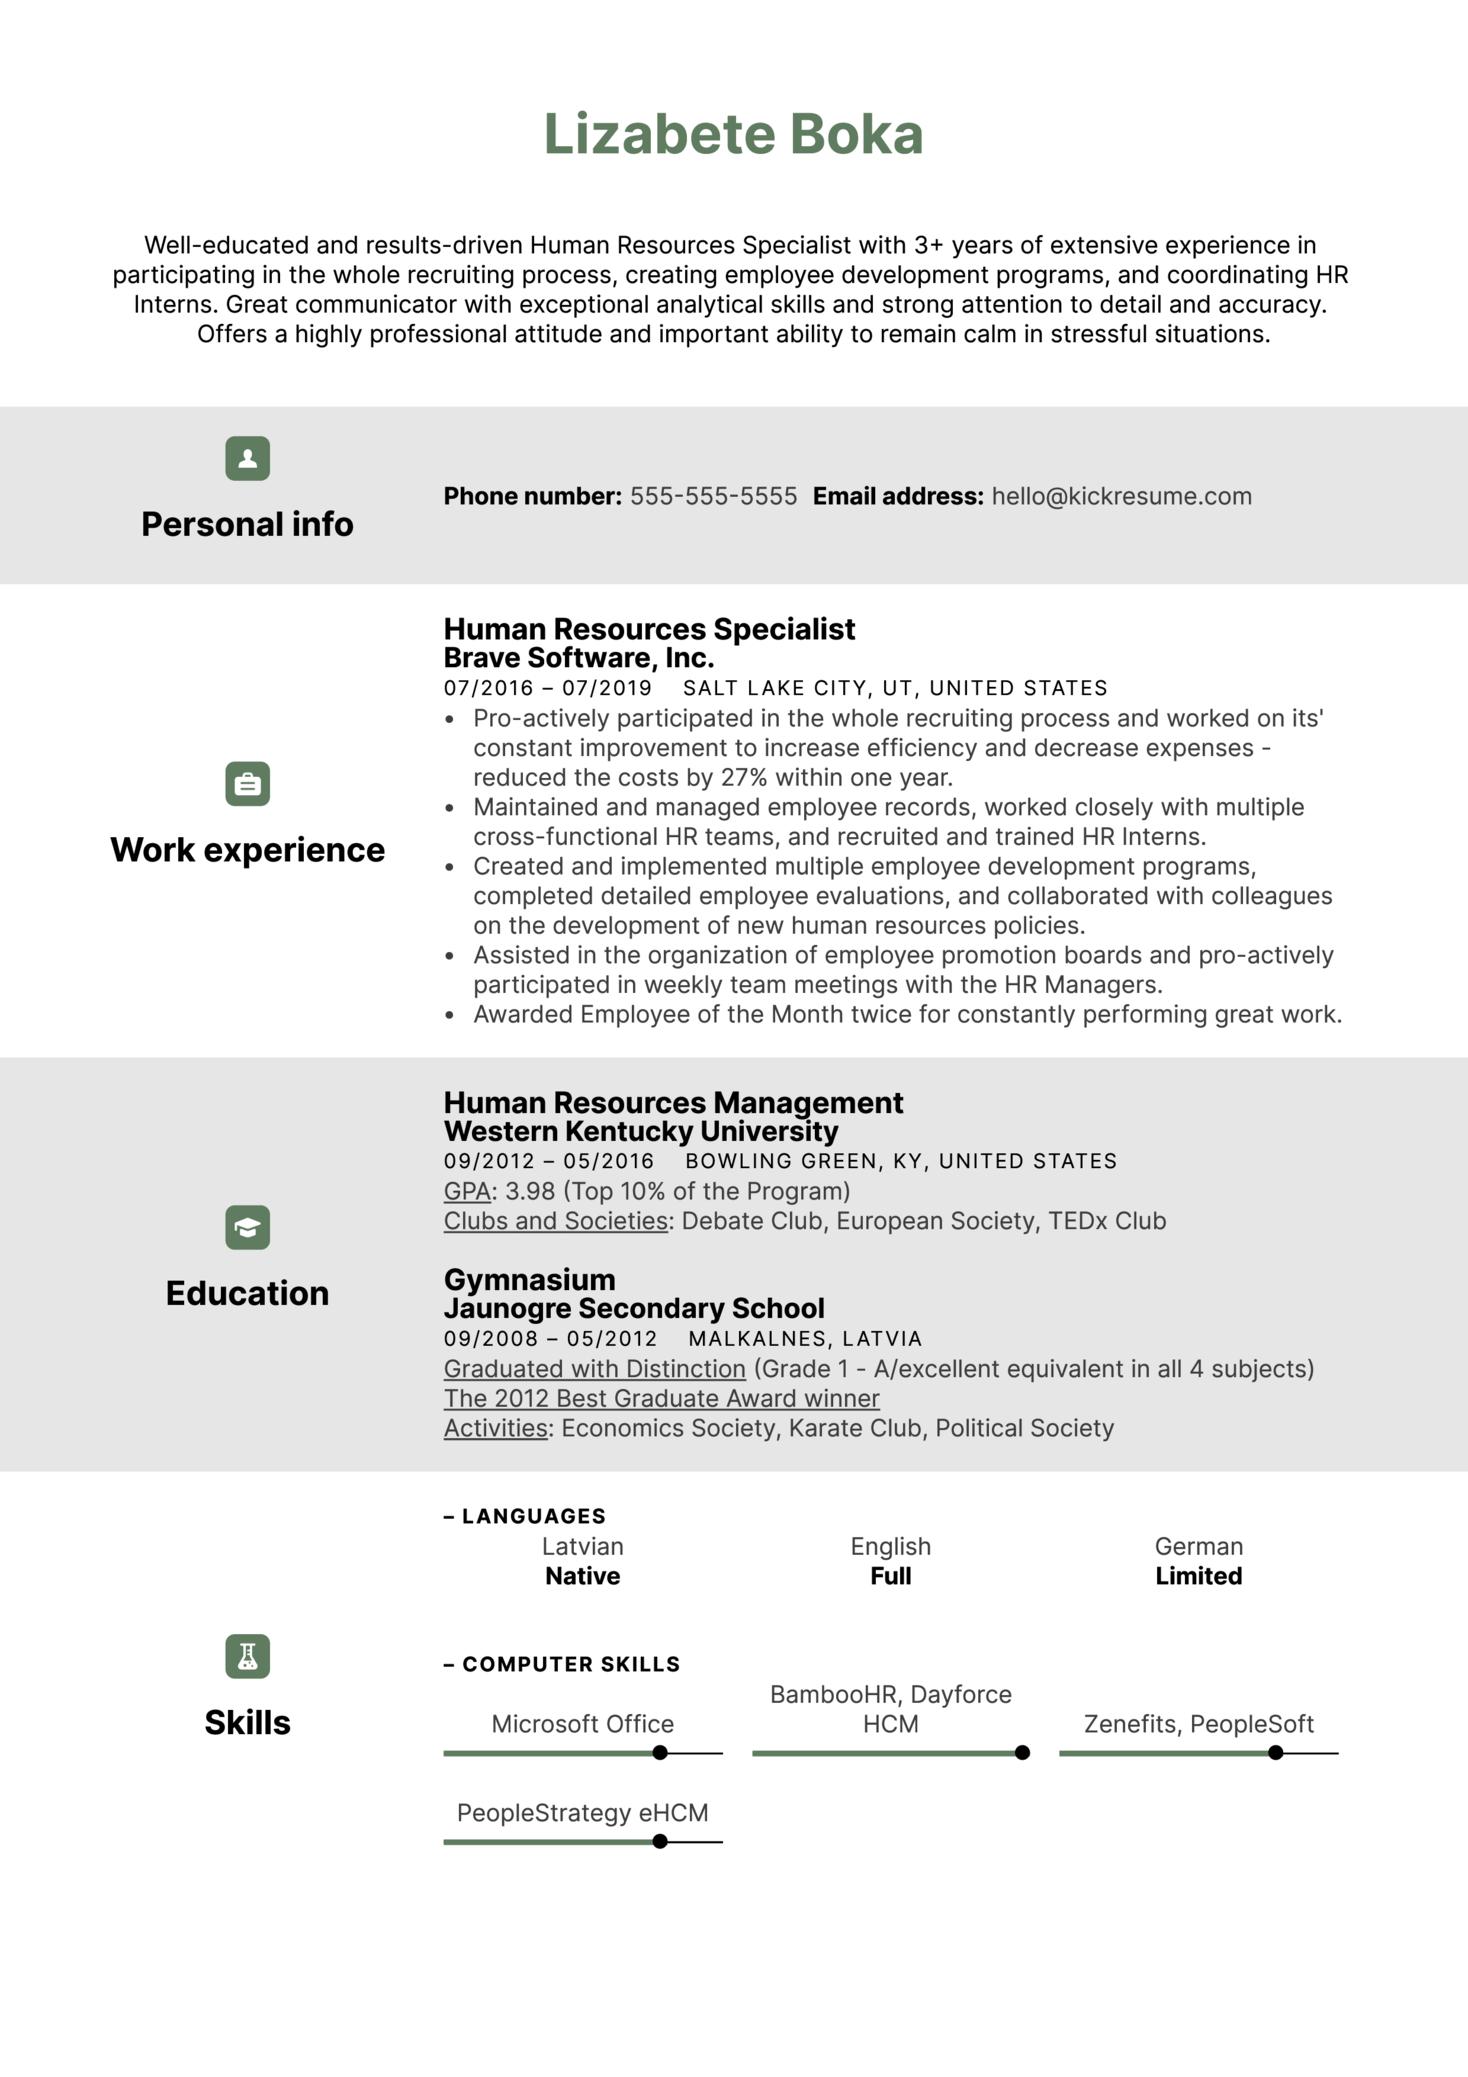 Human Resources Specialist Resume Example (časť 1)